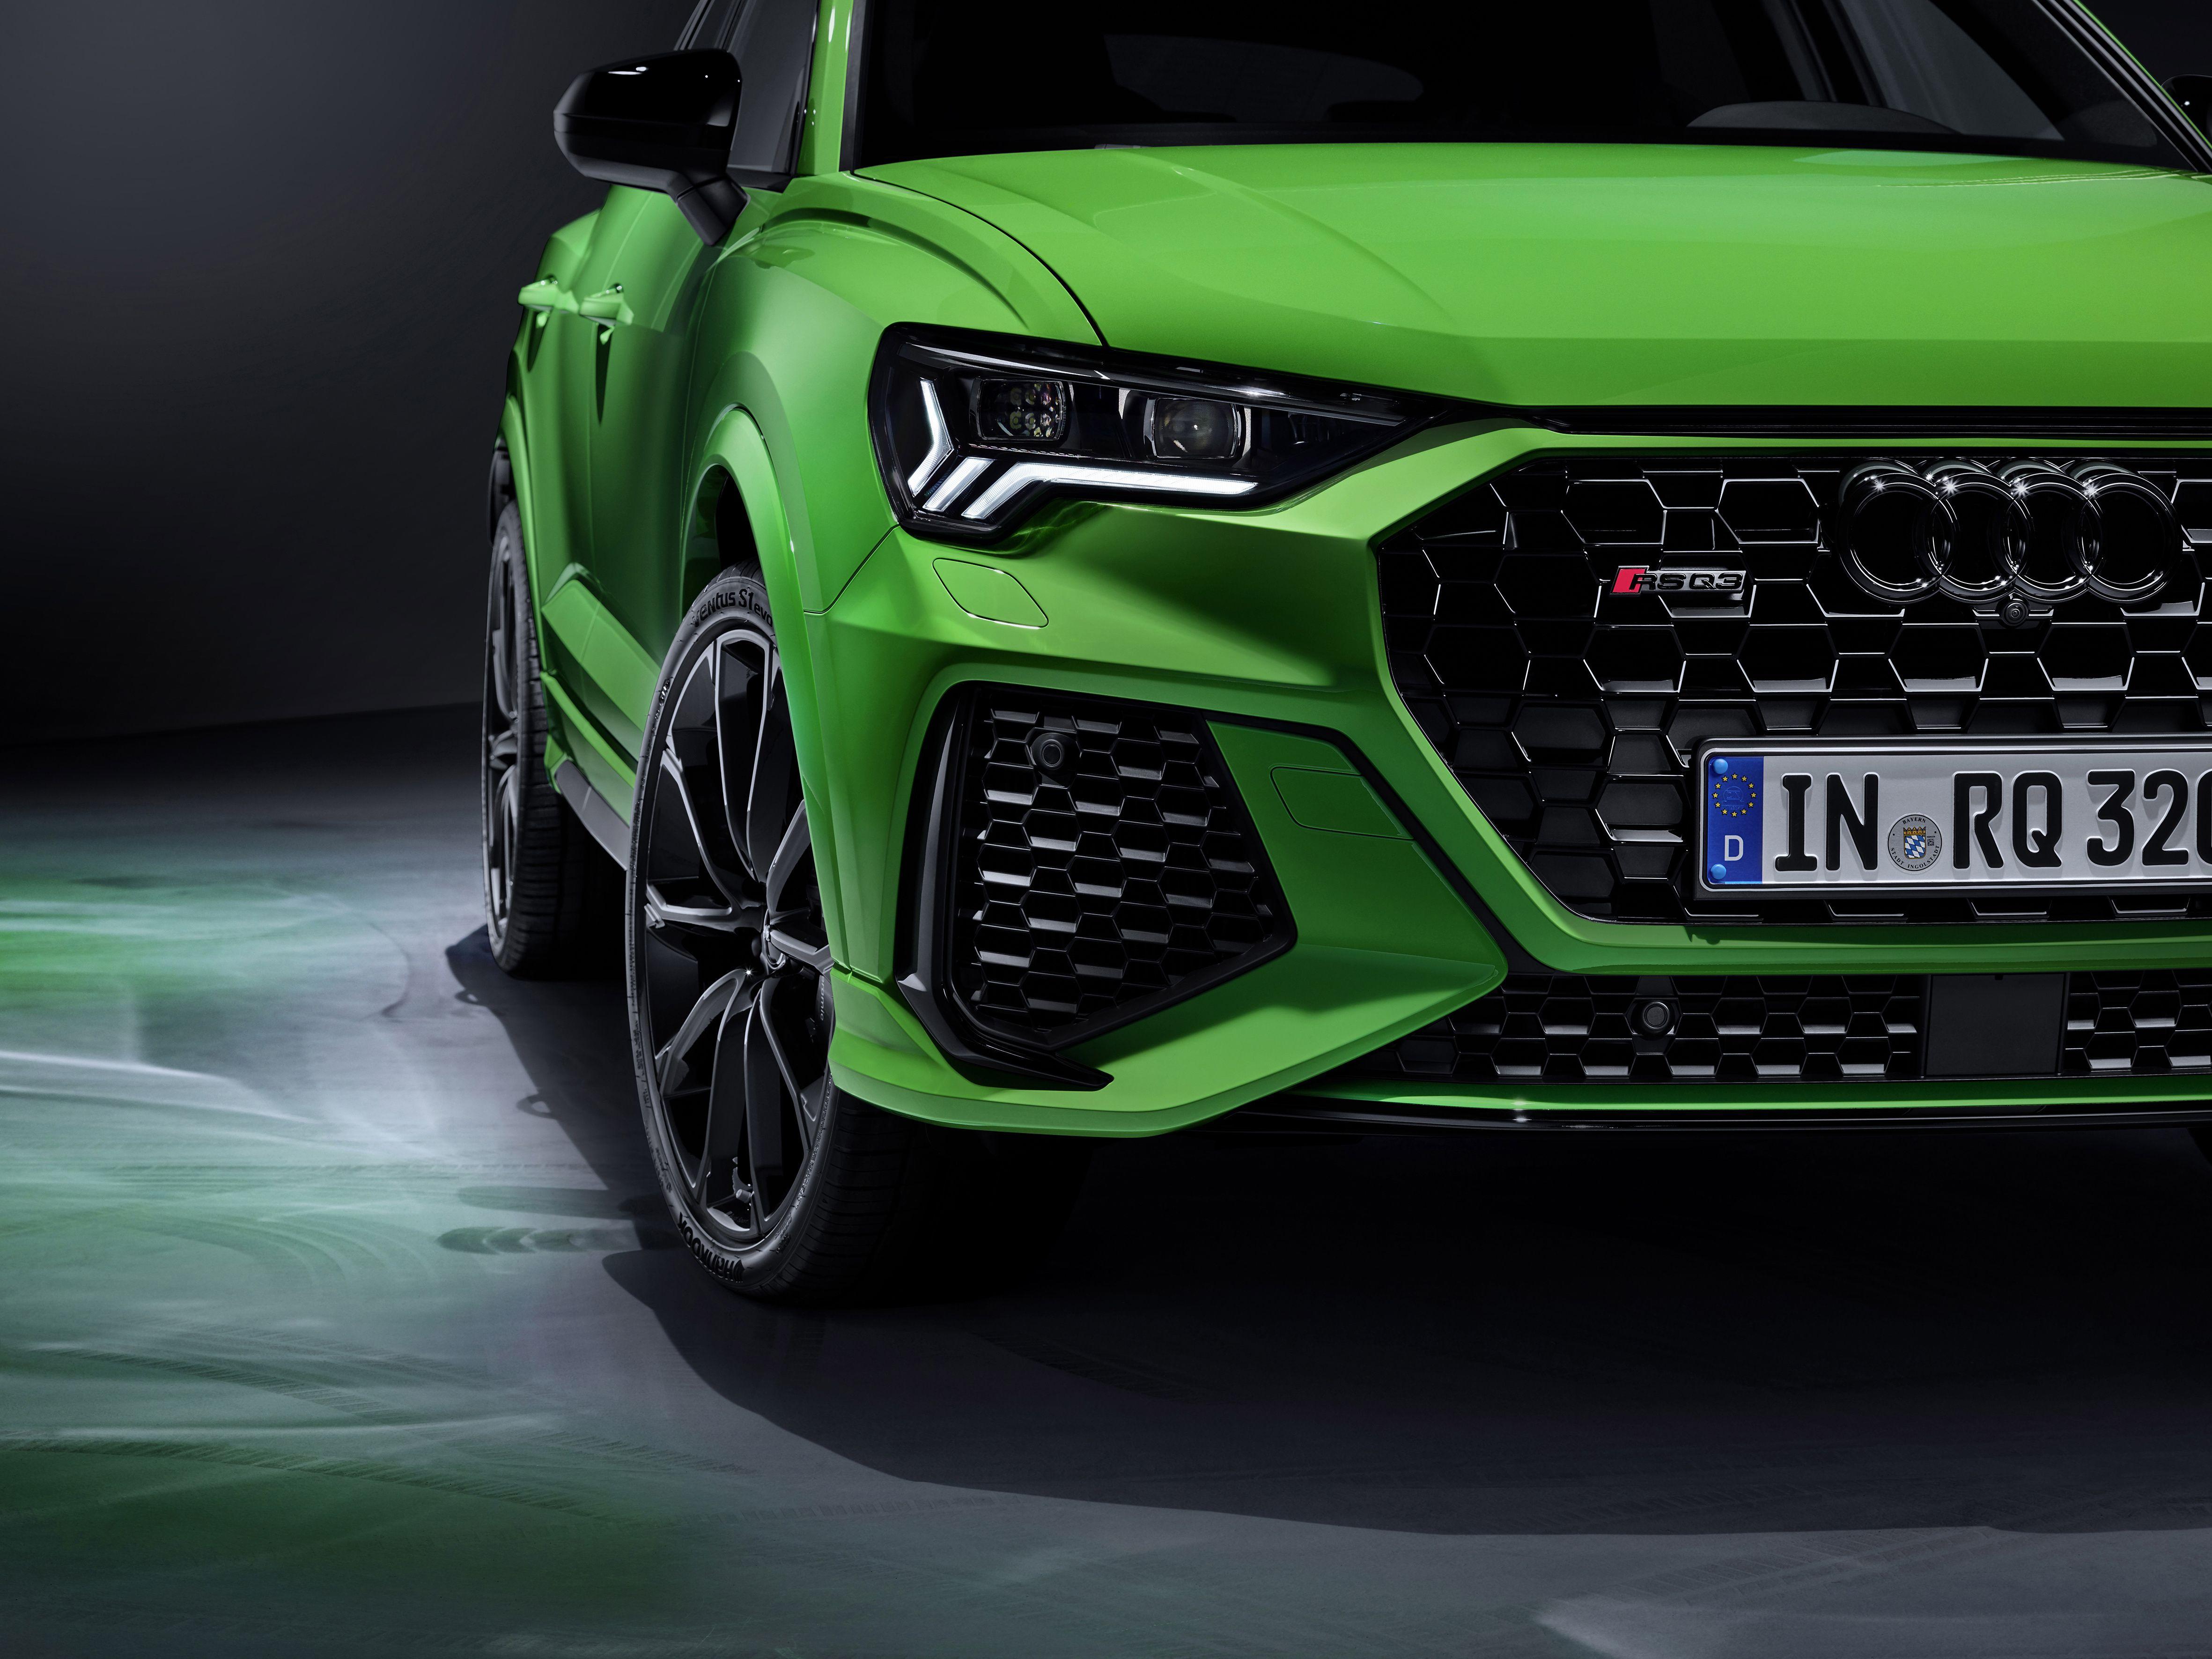 Audi Rs Q3 Sportback Audi Rs Audi Car Brands